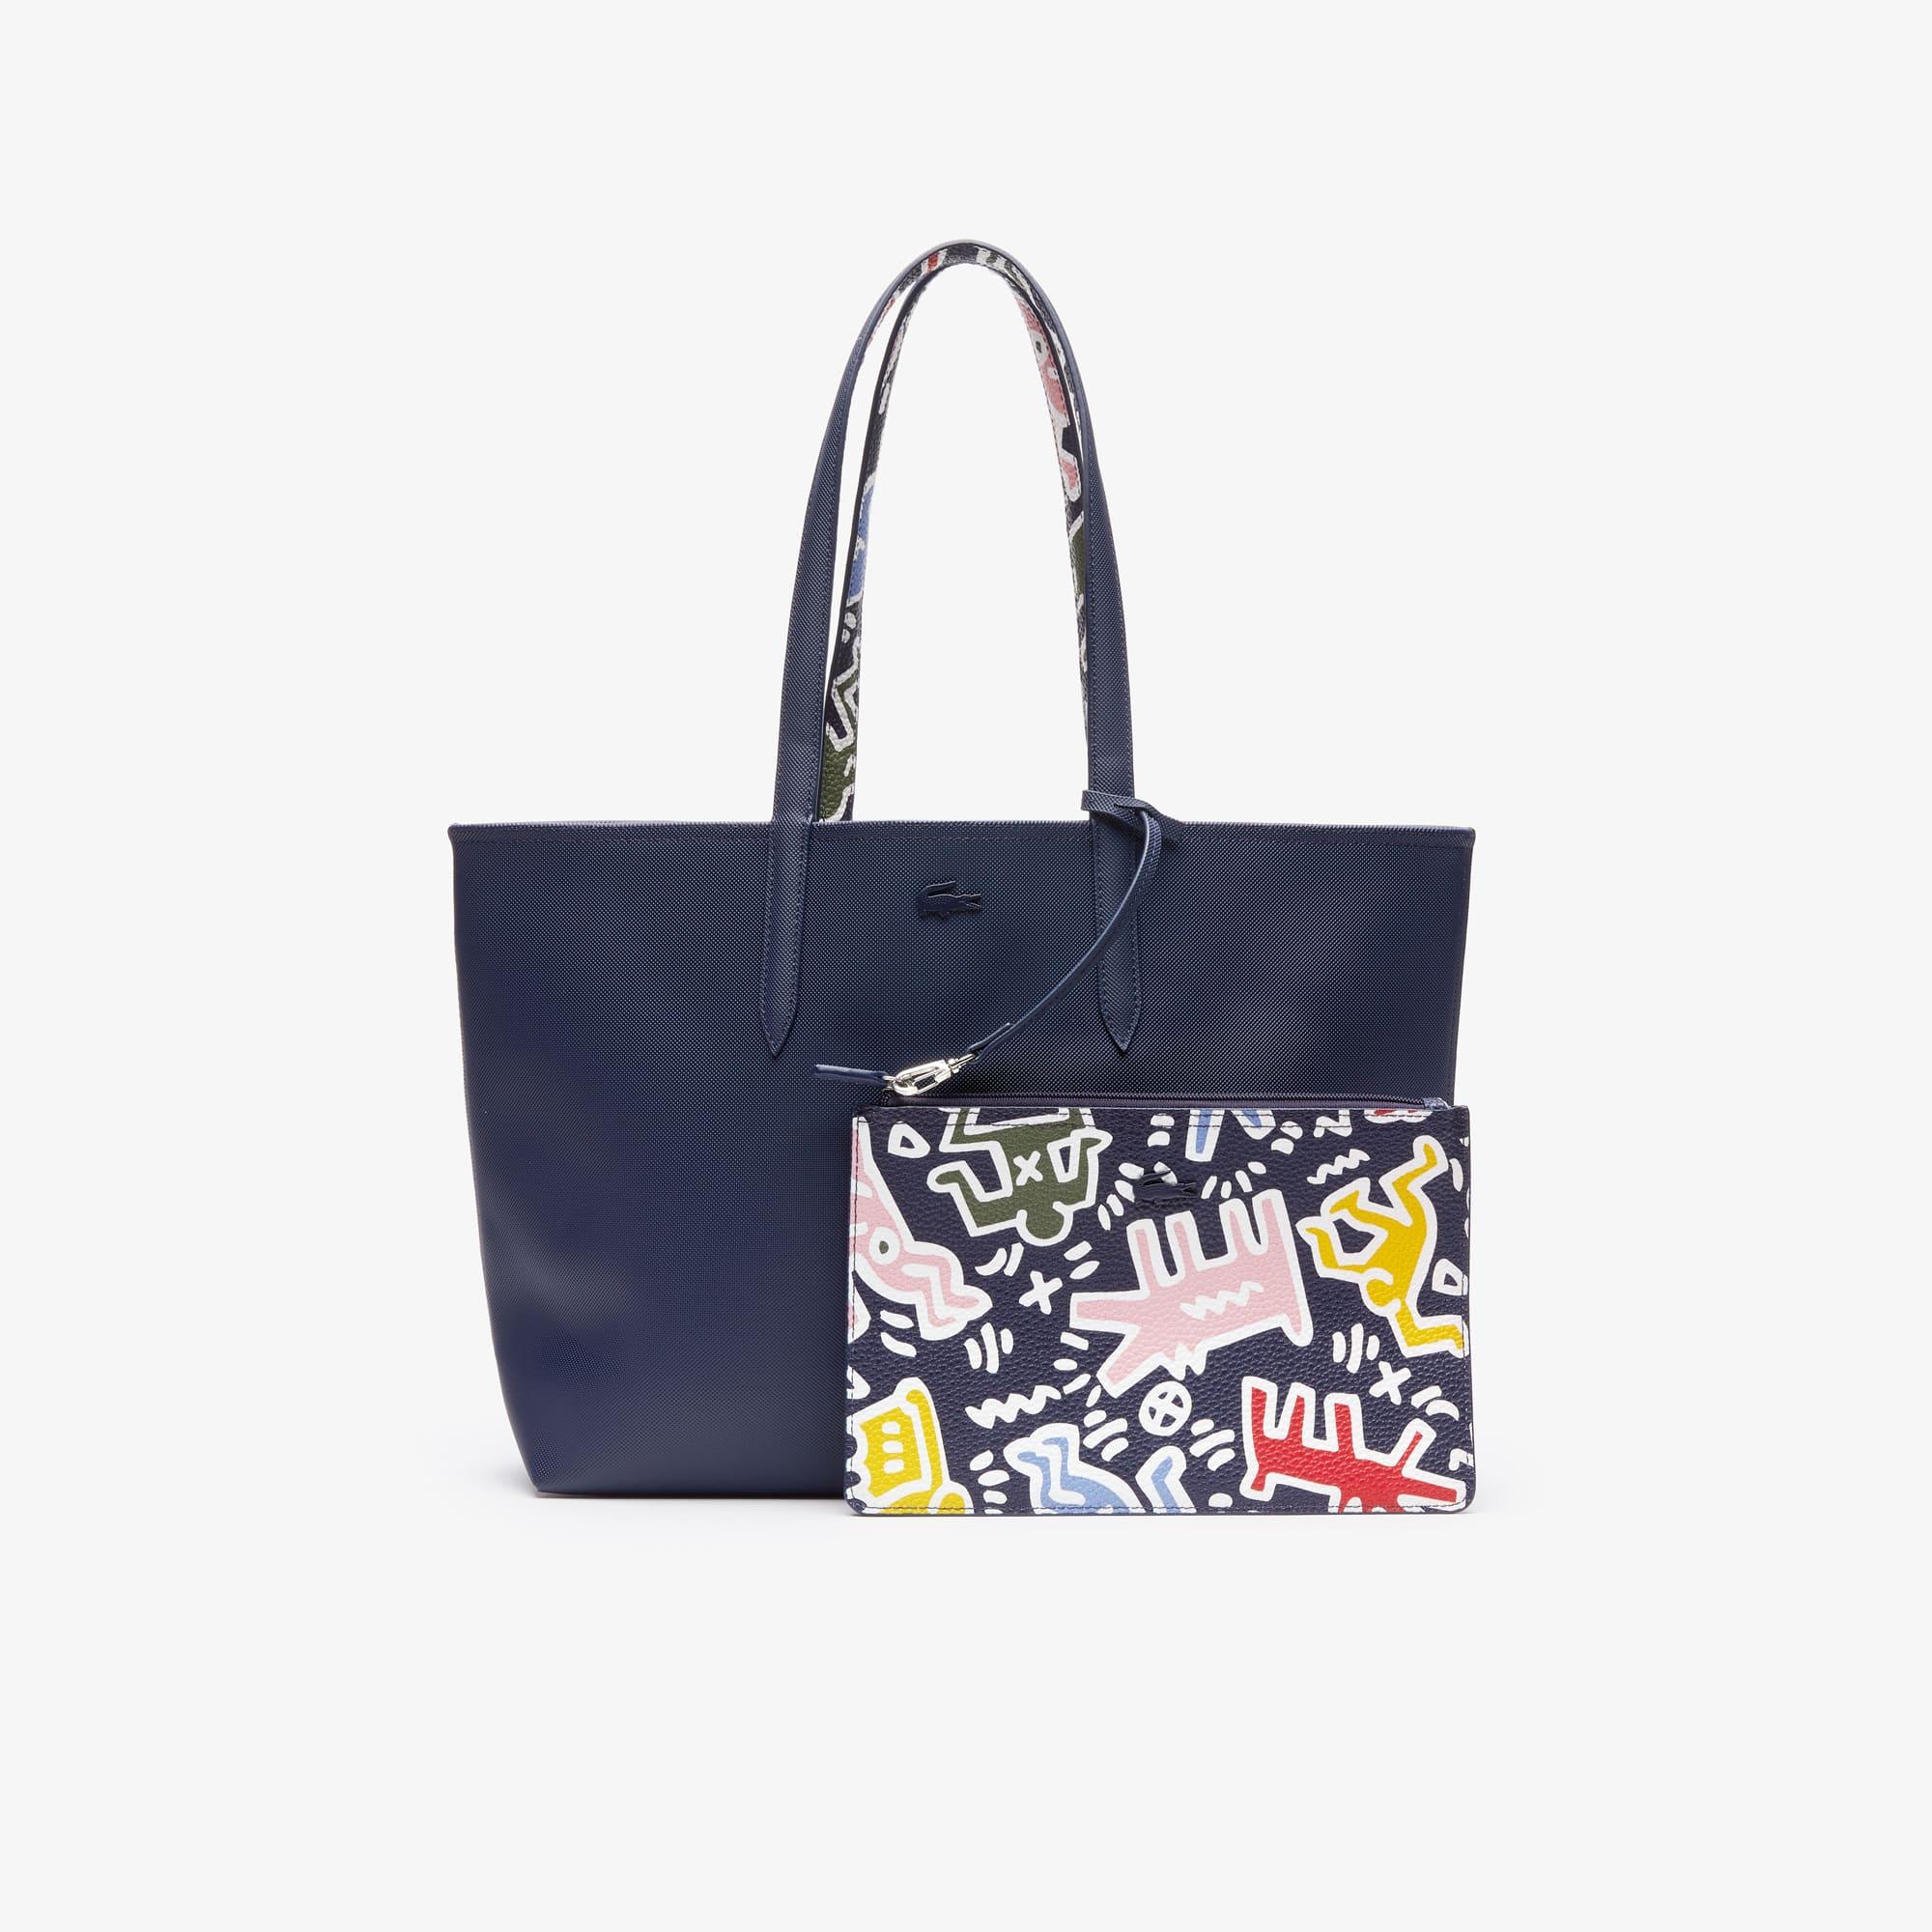 11a25a52ee Sacs à main cuir, sacs cabas | Maroquinerie femme | LACOSTE